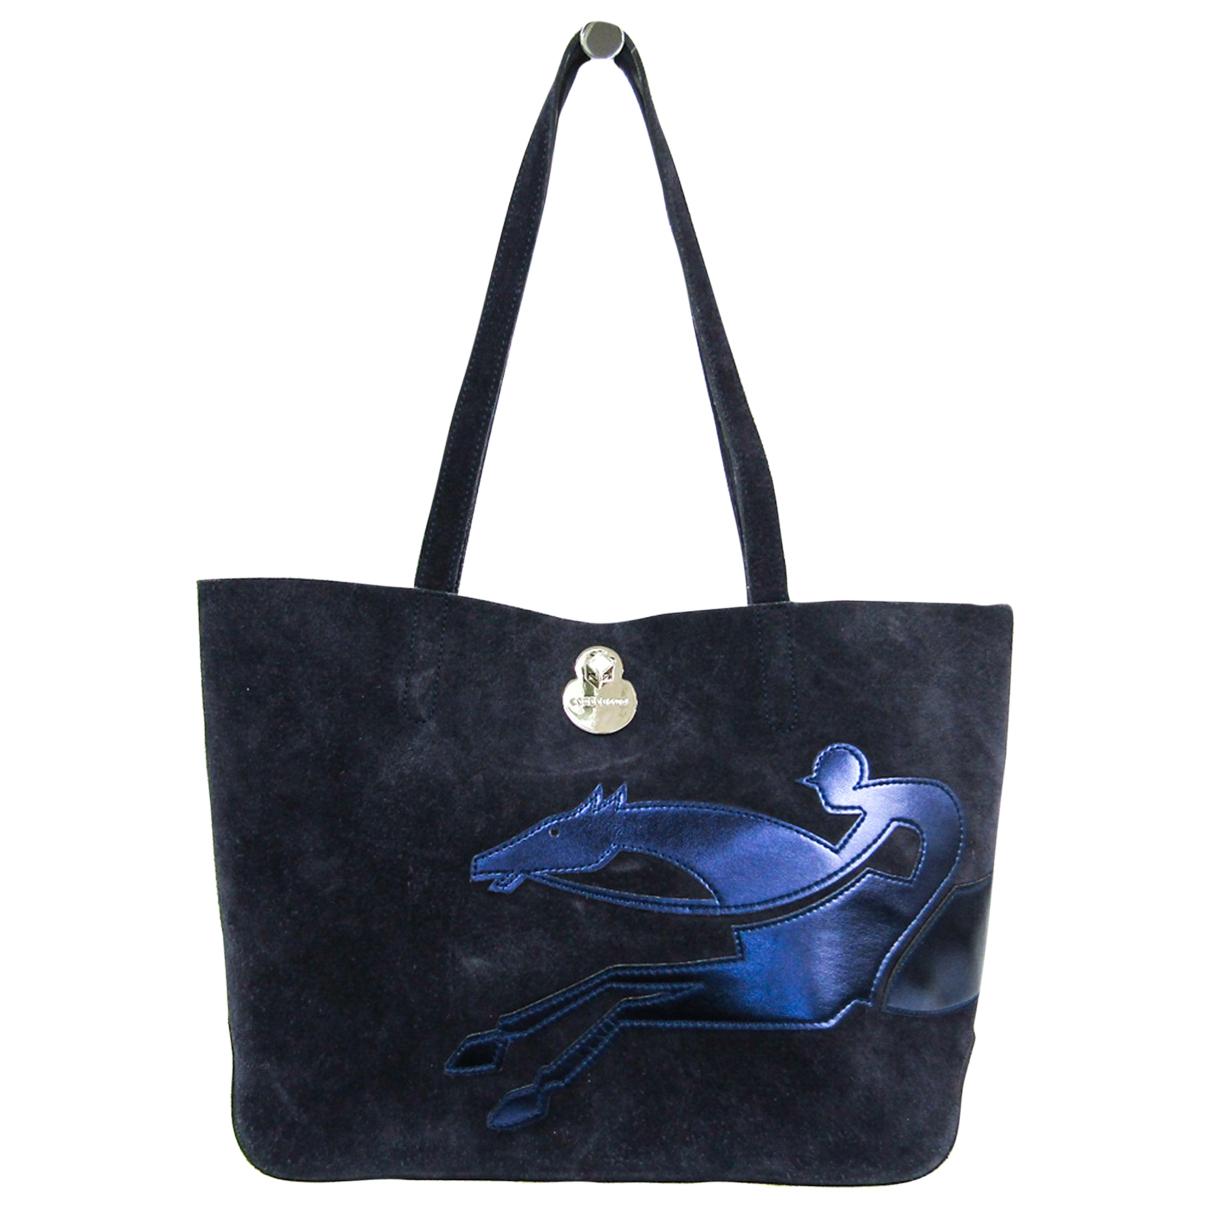 Longchamp - Sac a main   pour femme en cuir - marine